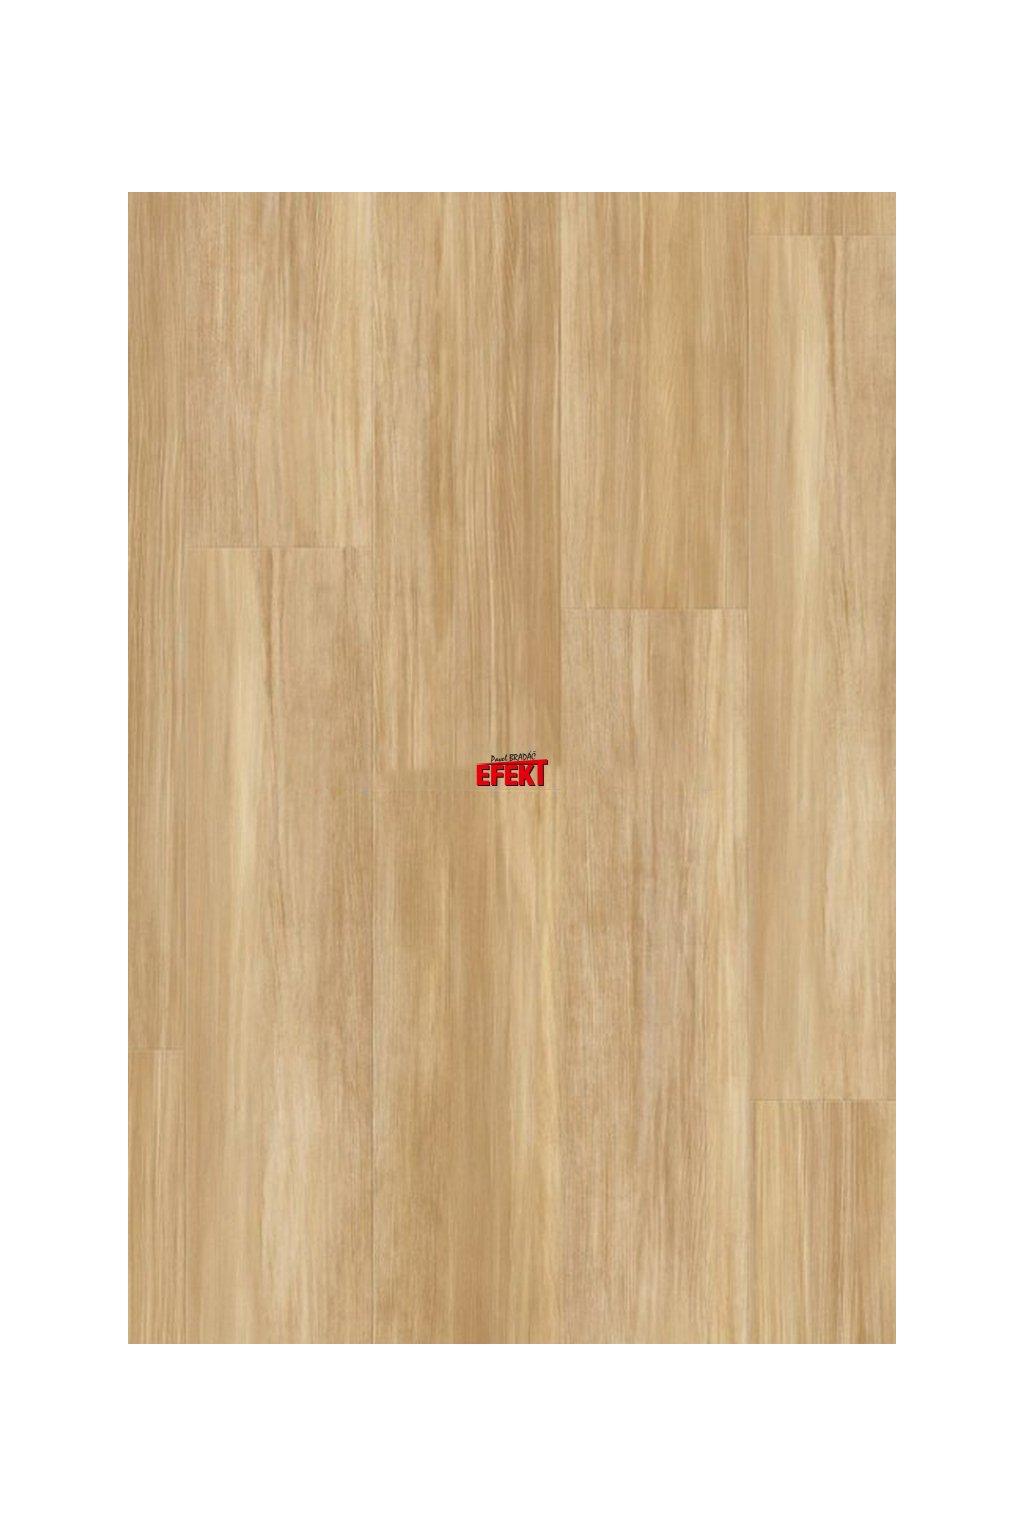 Gerflor Clic 55 Stripe oak Honey